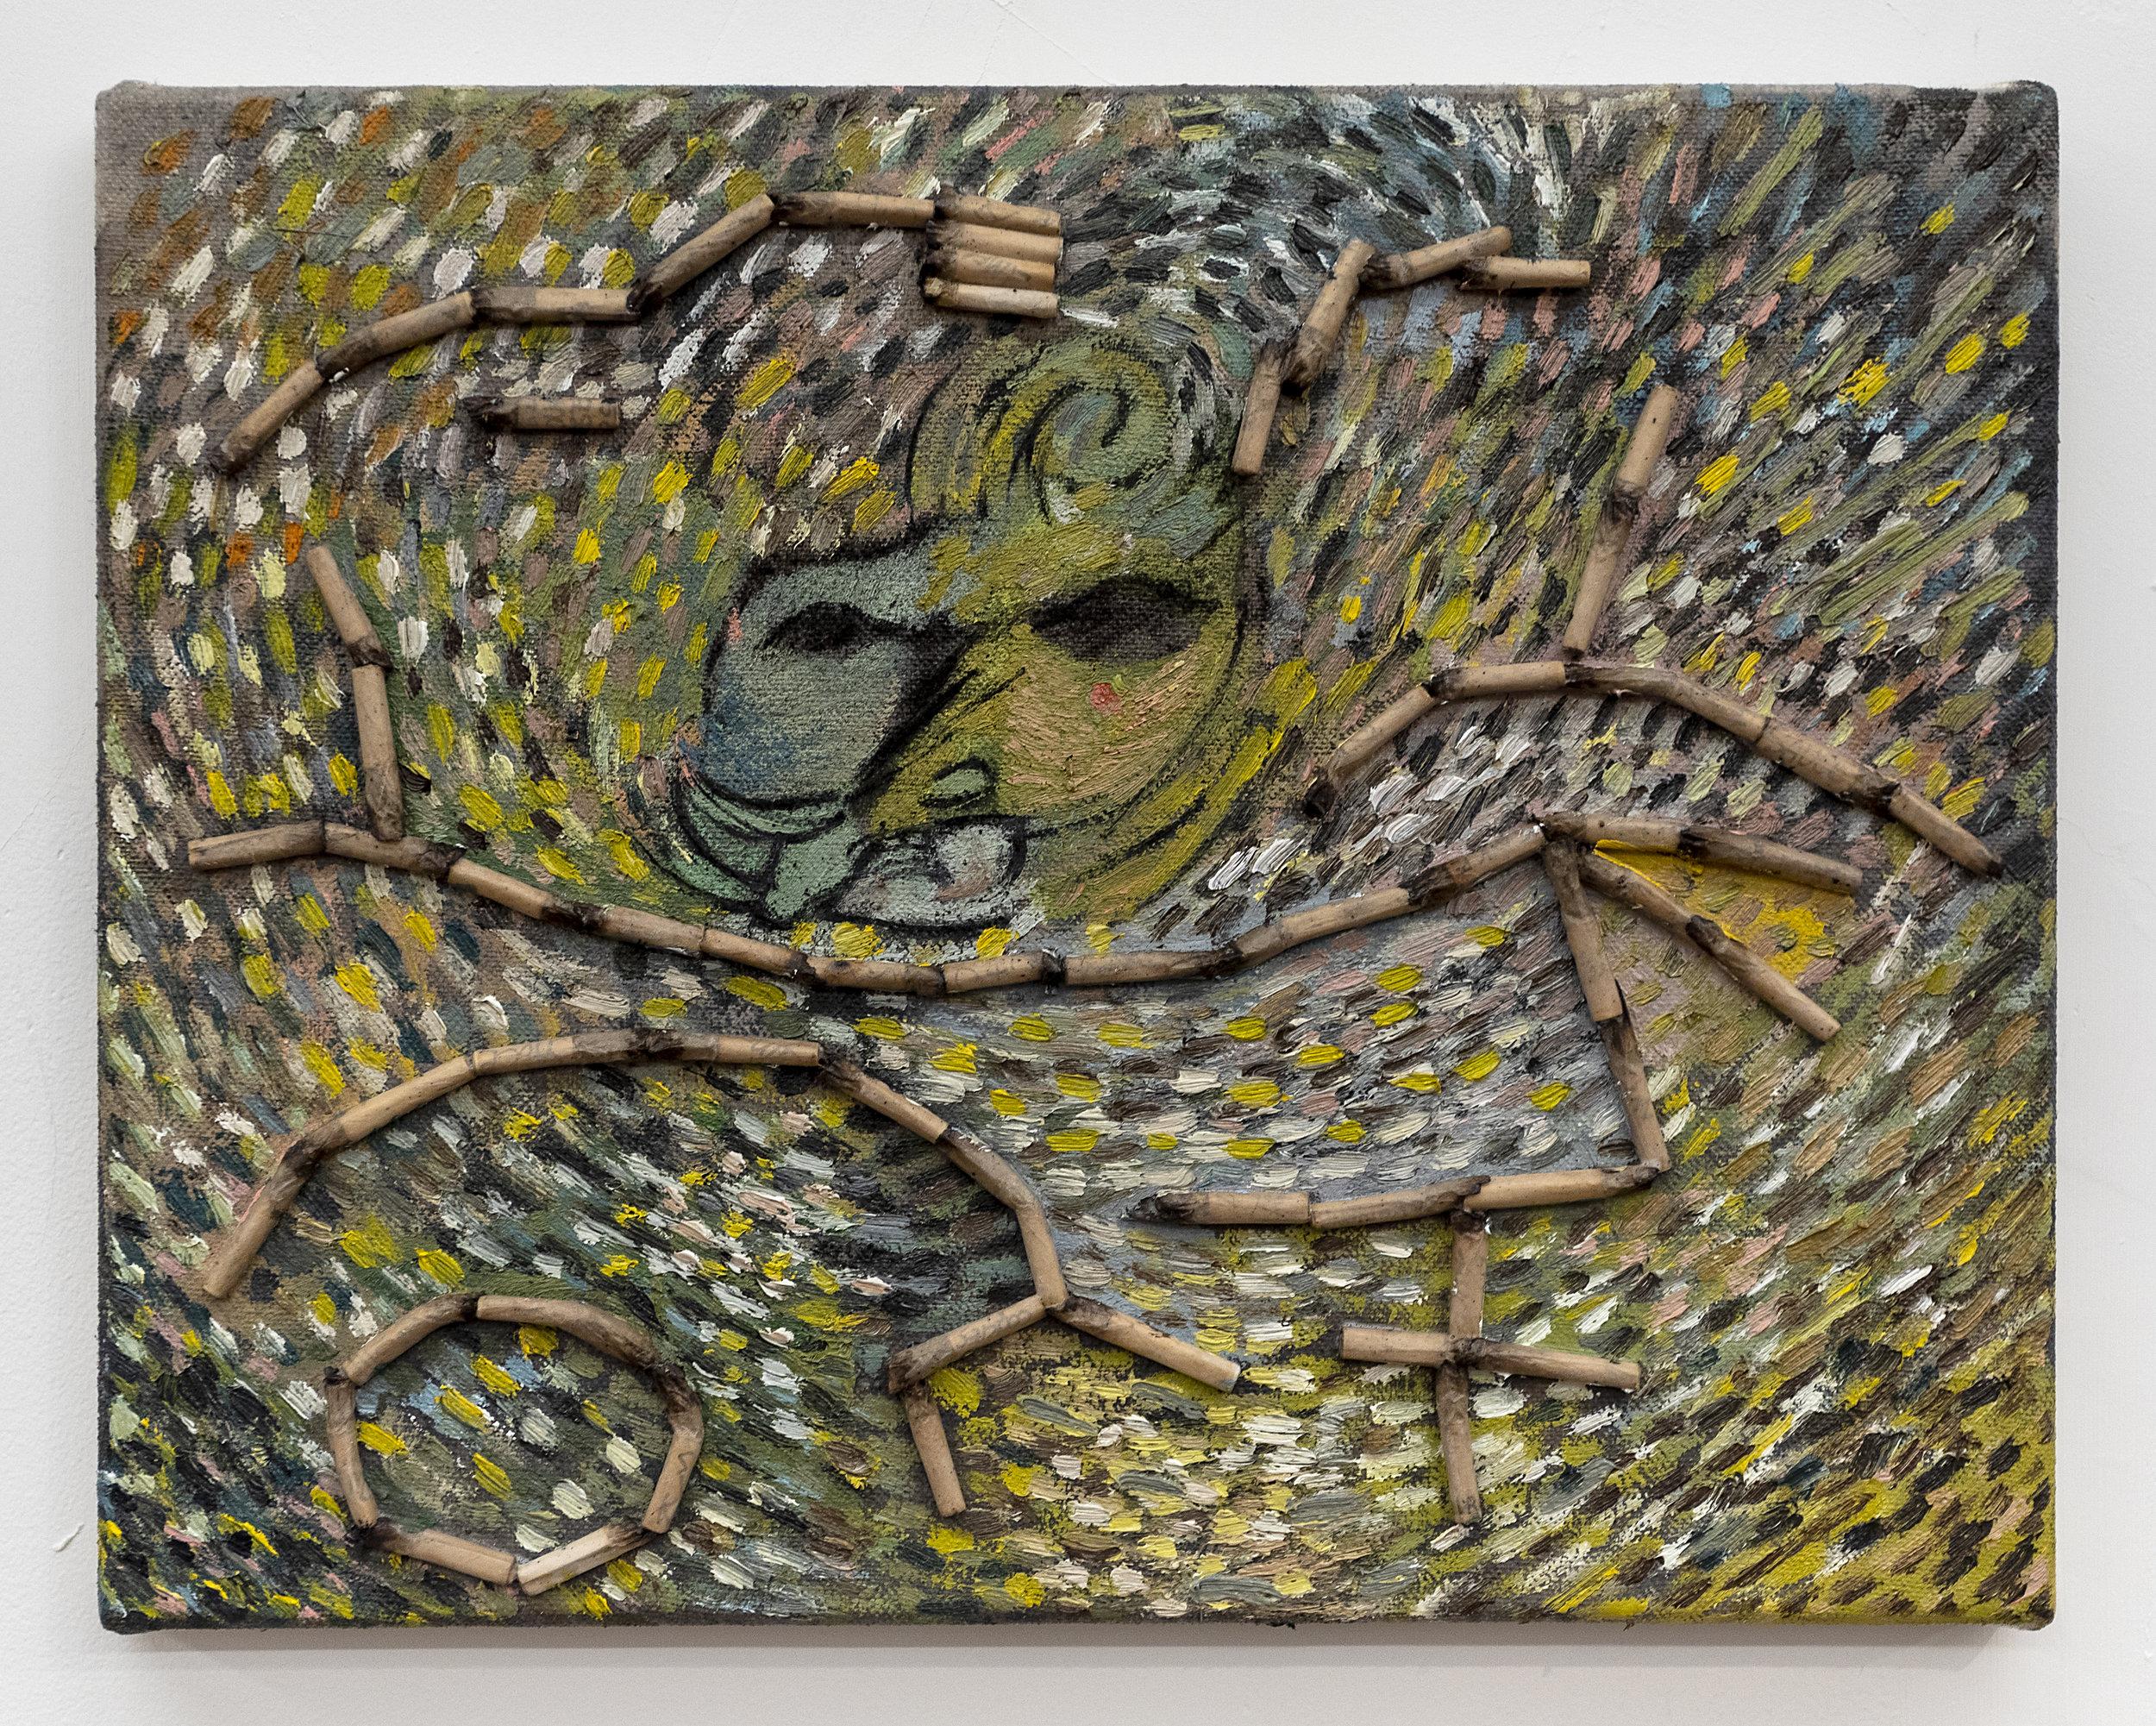 Matias Argañaraz  Untitled (C.o.M.P.a.S)  2018 Oil and roaches on canvas 11 x 14 inches